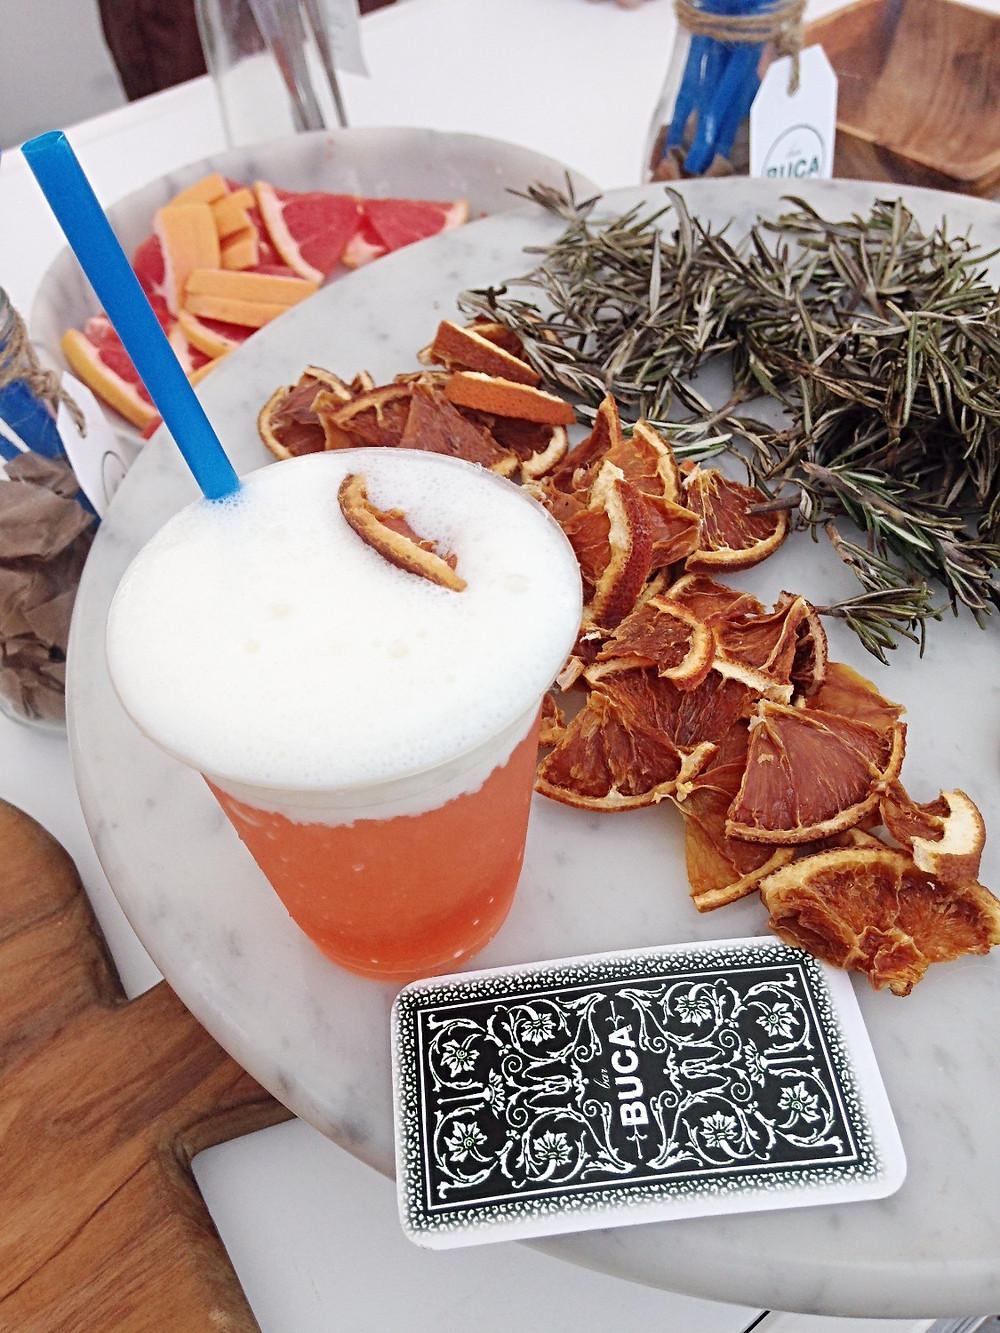 Noie Lifestyle: Negroni Granita from Bar Buca